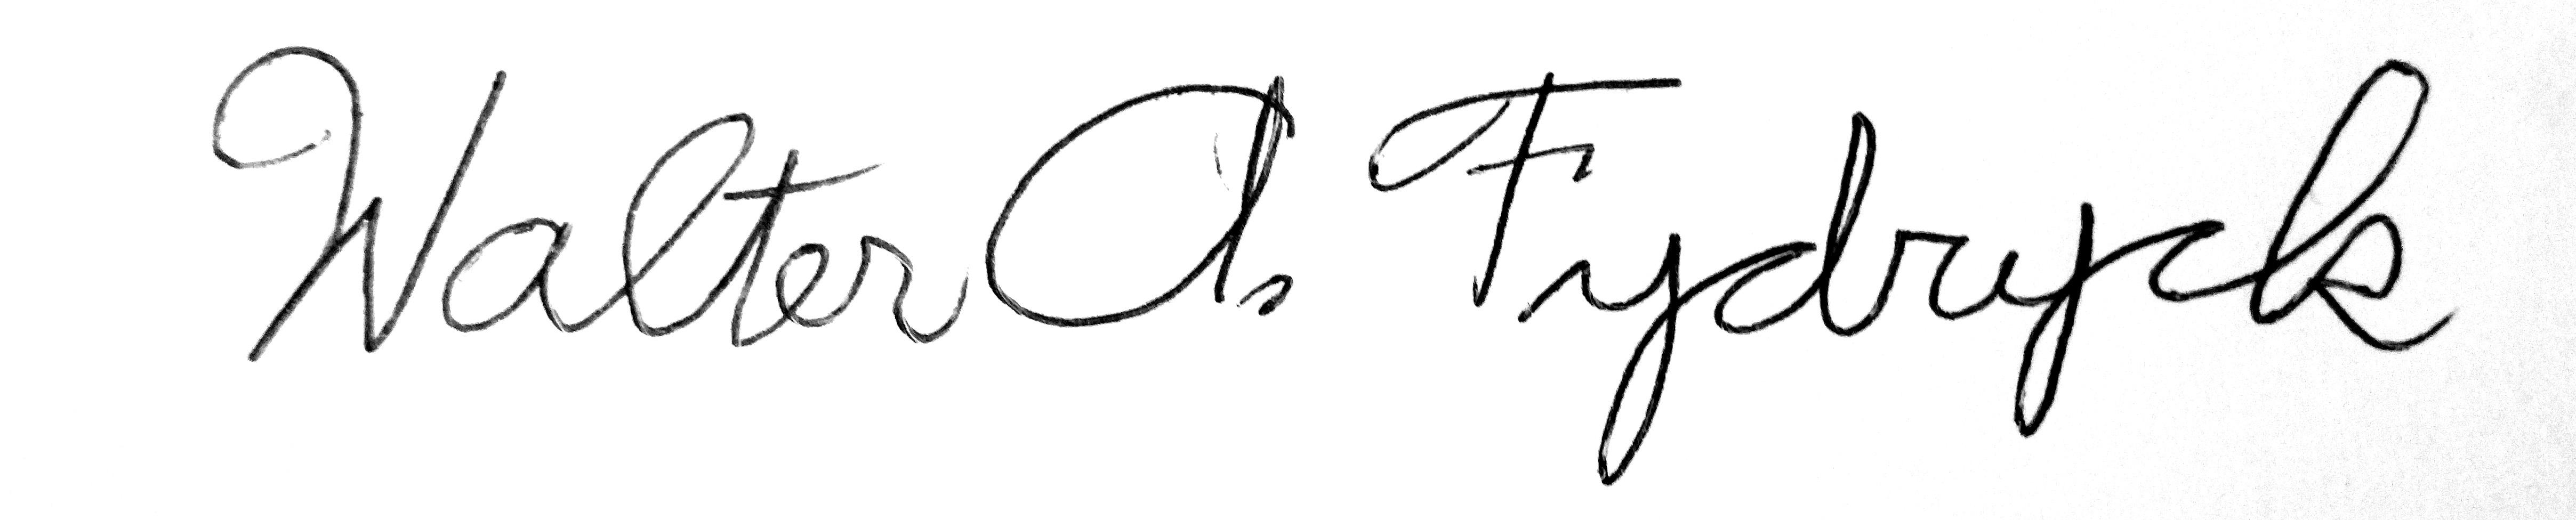 Walter Fydryck's Signature